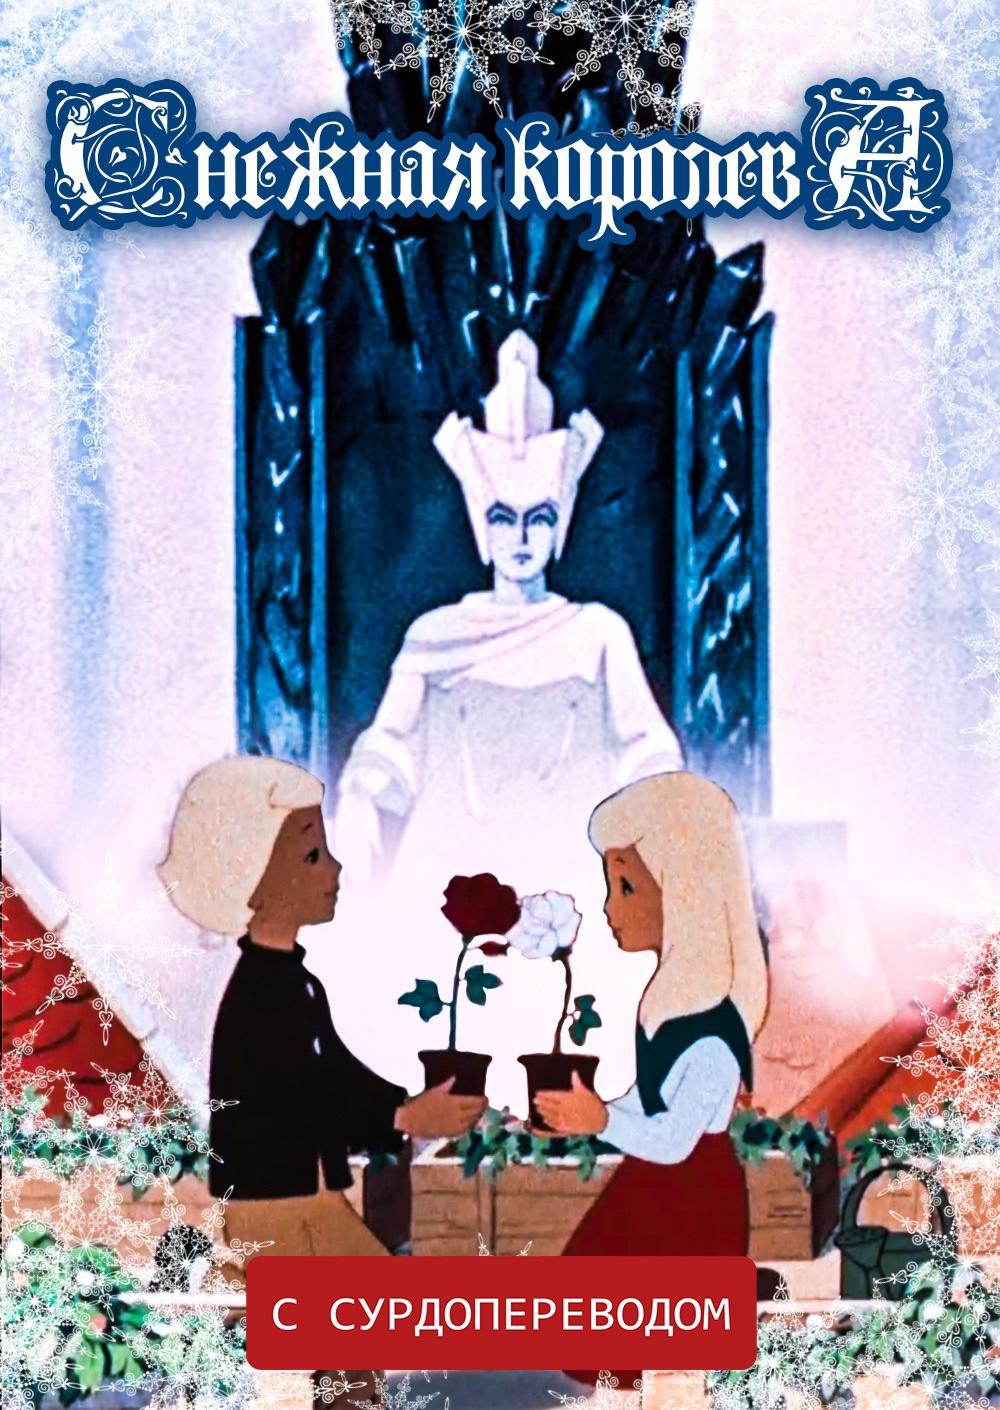 Снежная королева (Сурдоперевод)